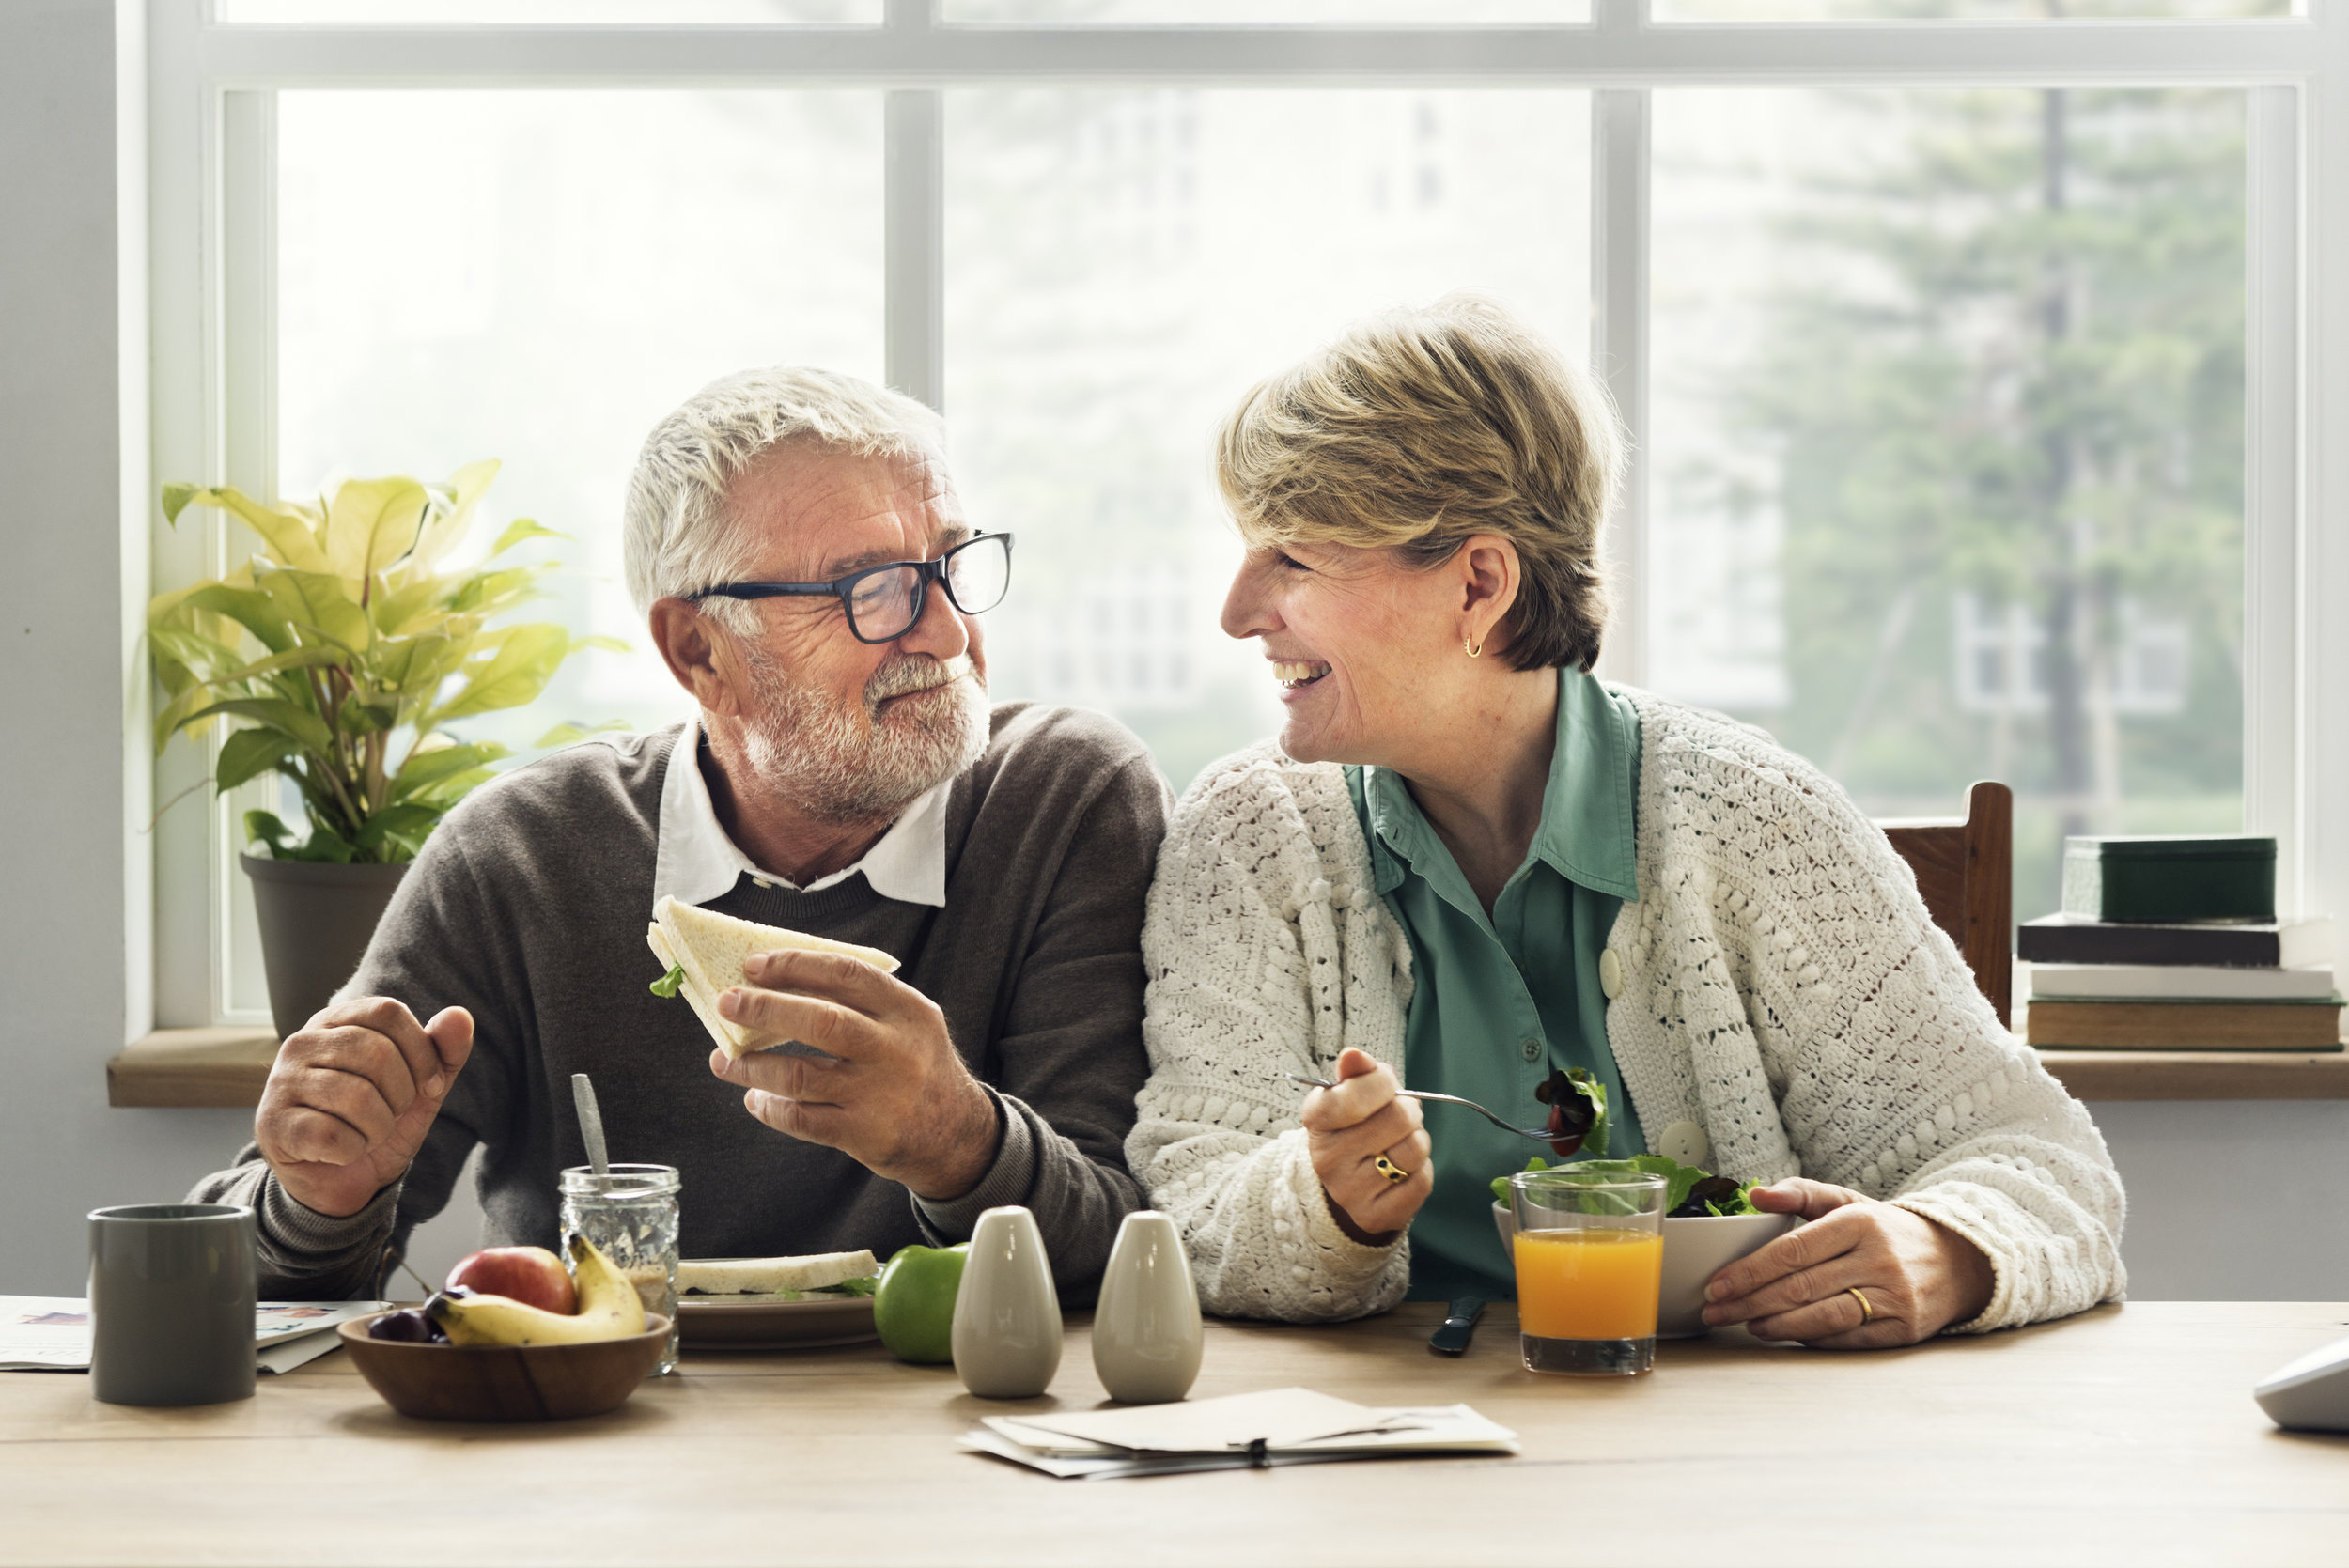 bigstock-Retirement-Senior-Couple-Lifes-147936659.jpg